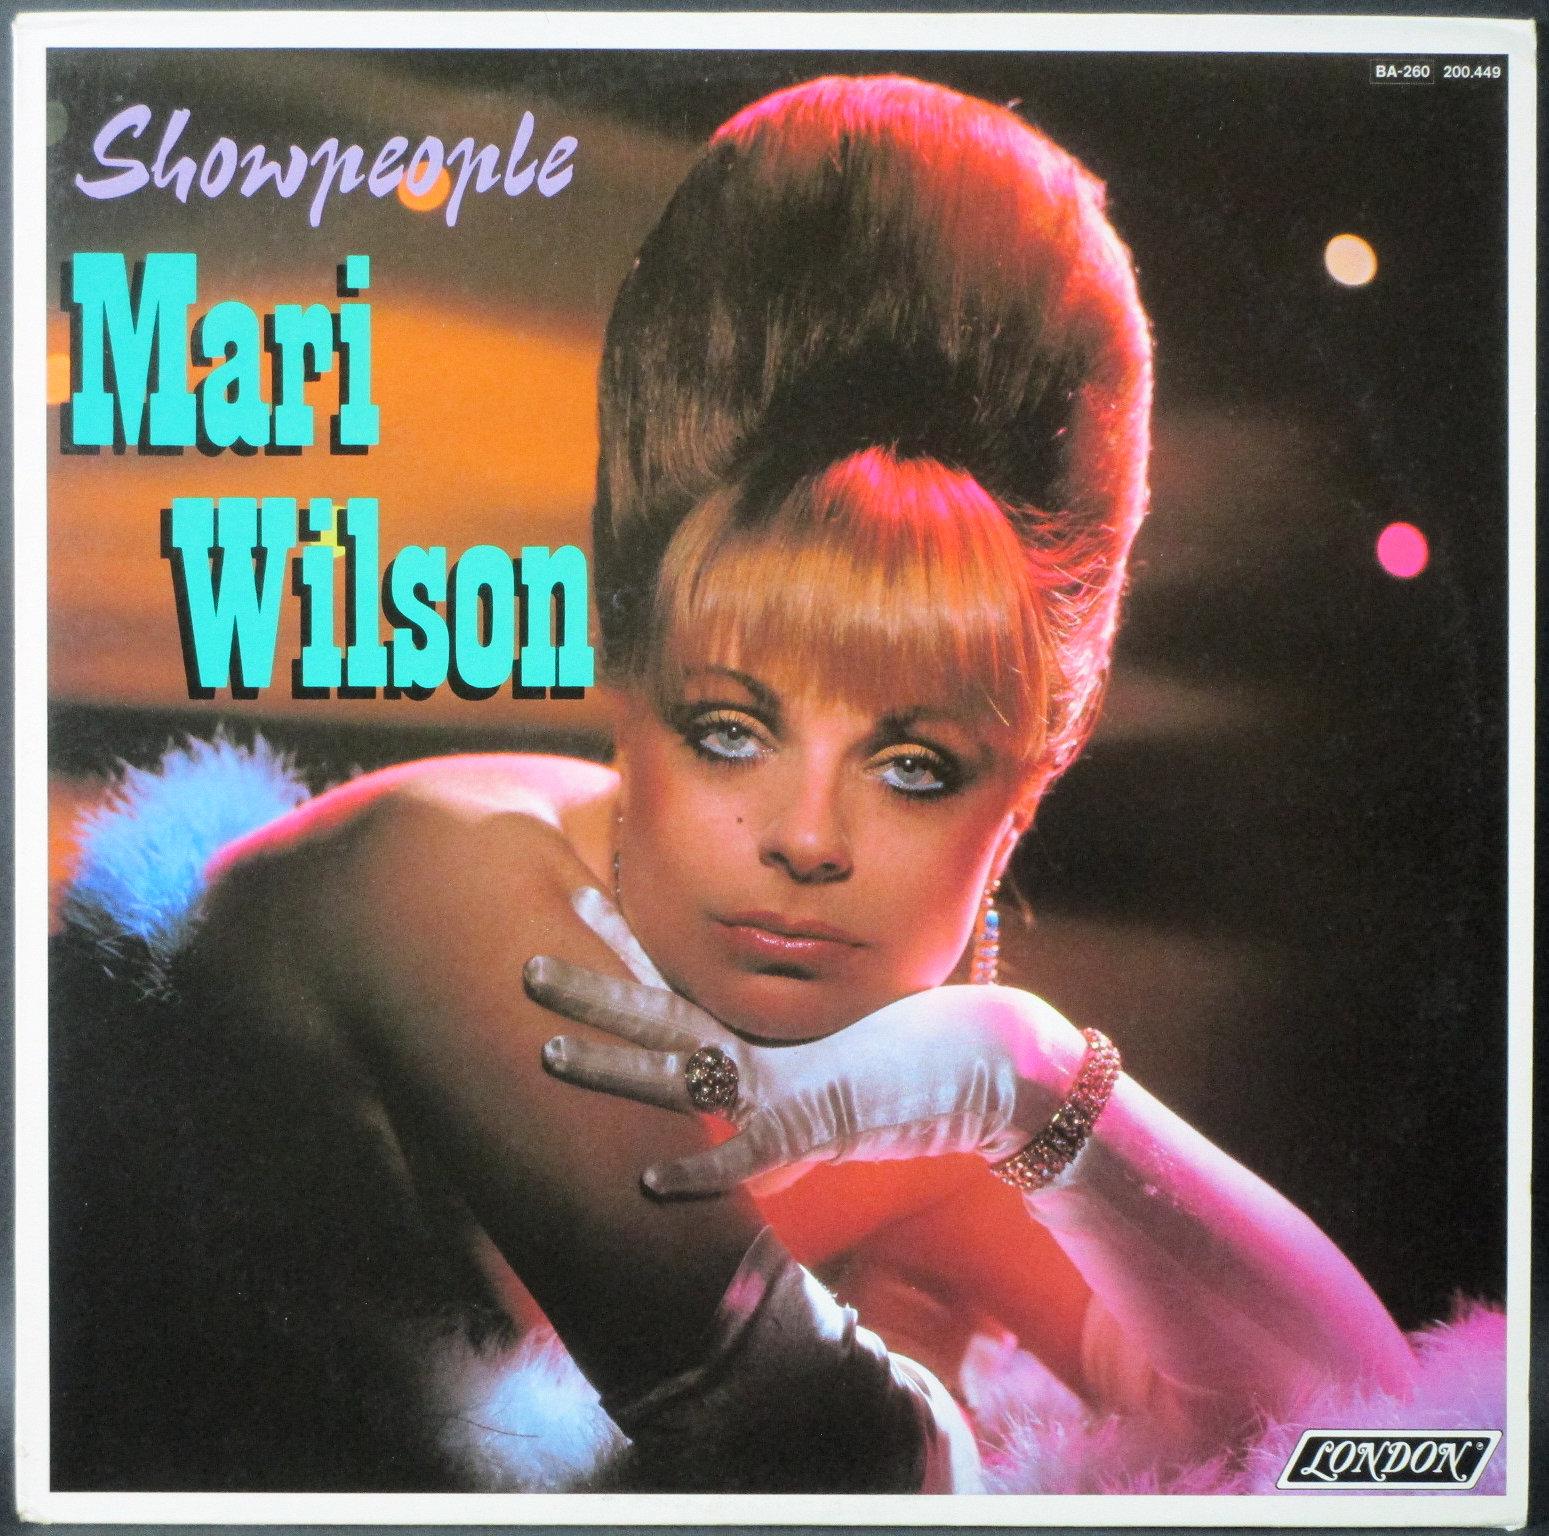 Mari Wilson マリ・ウィルソン / Showpeople